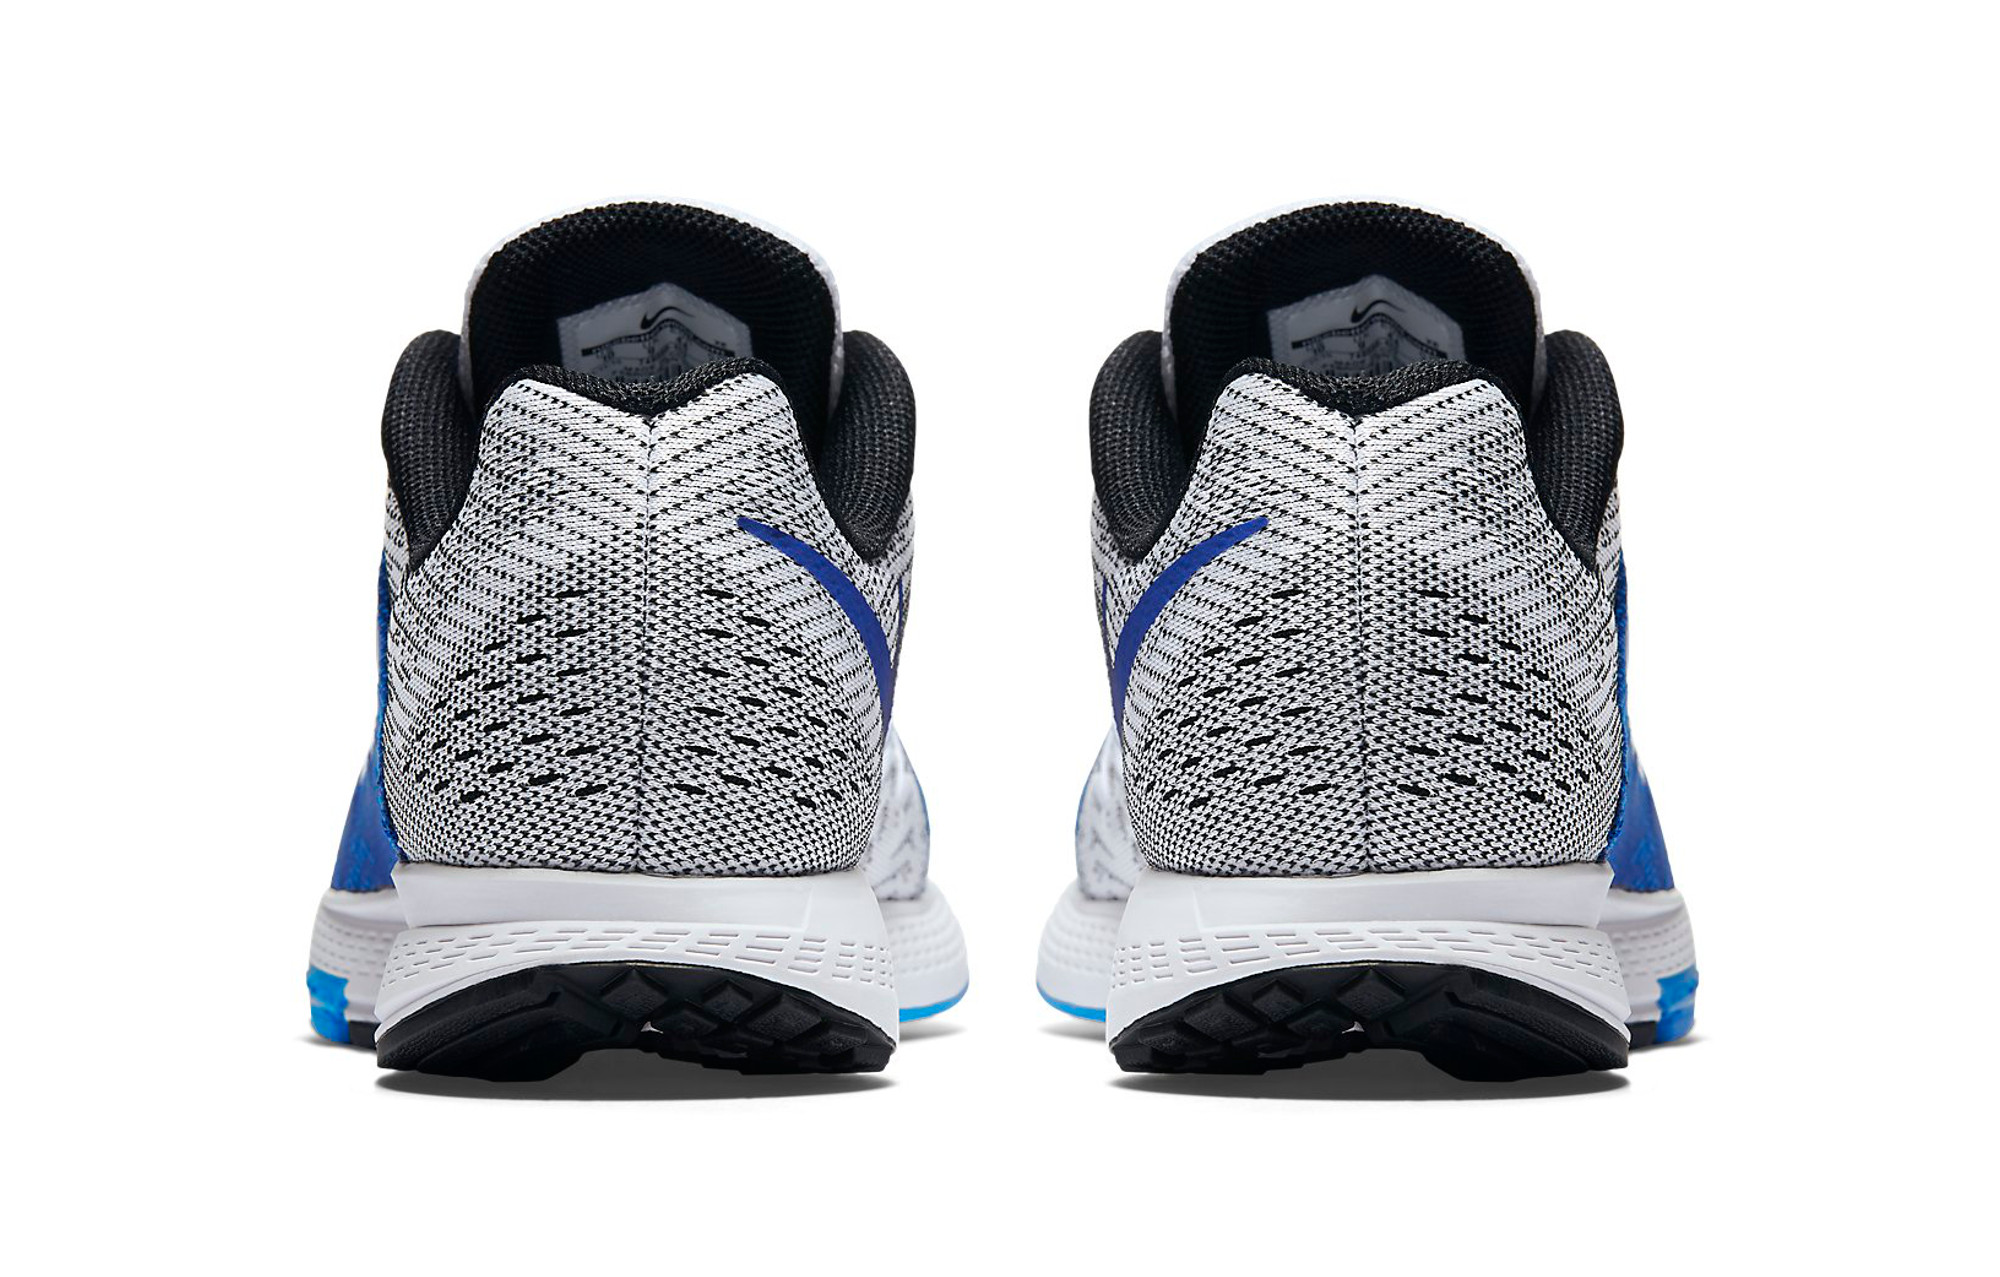 newest 4f96e 8ed2f Chaussures de Running Nike AIR ZOOM ELITE 8 Bleu